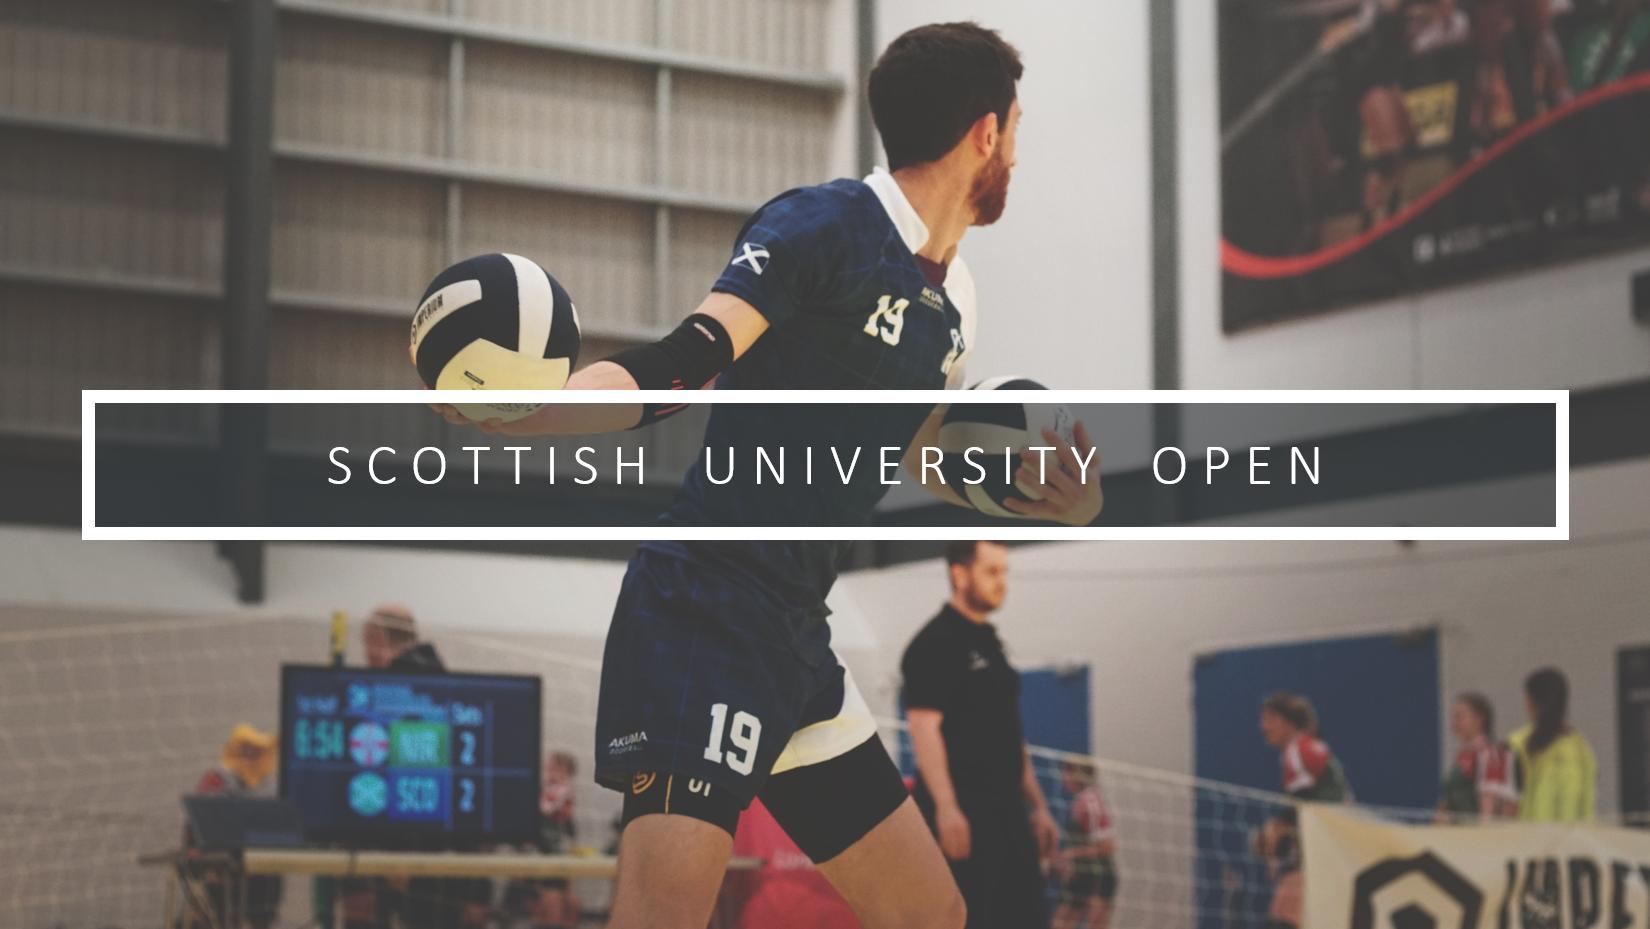 Scottish University Open